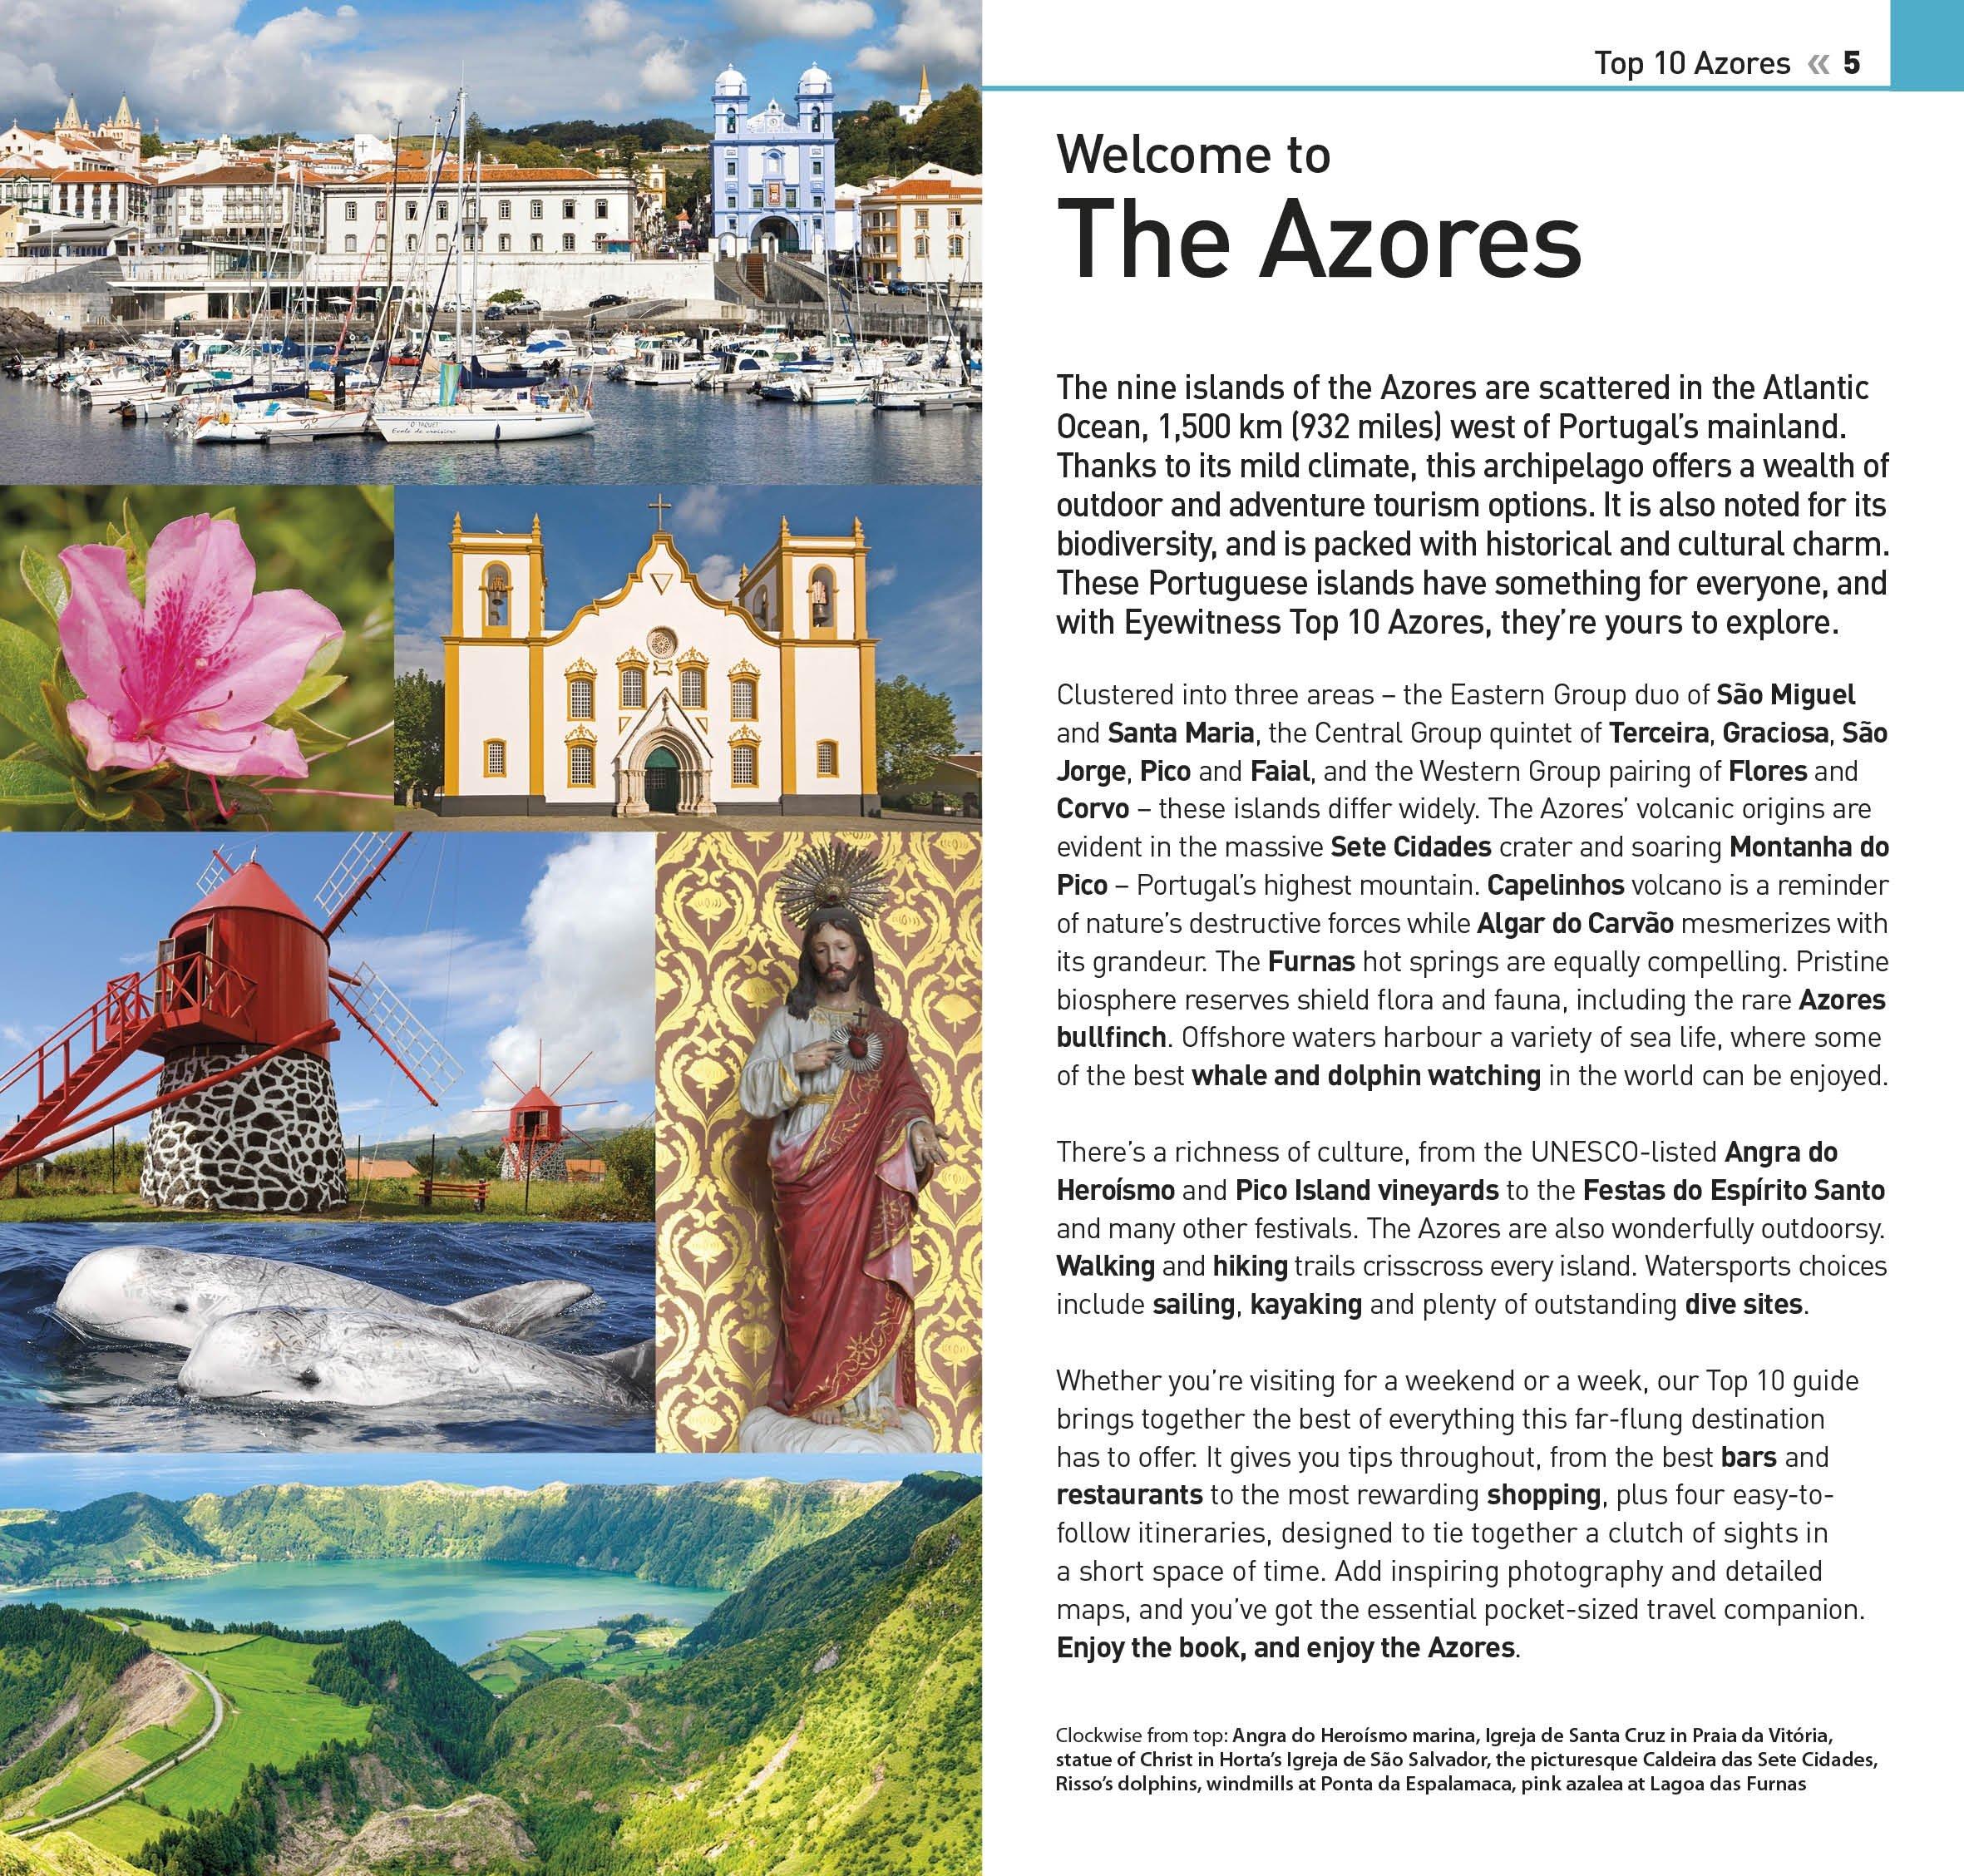 Top 10 Azores (DK Eyewitness Travel Guide)  DK Travel  9781465460646   Amazon.com  Books 69774cc9f